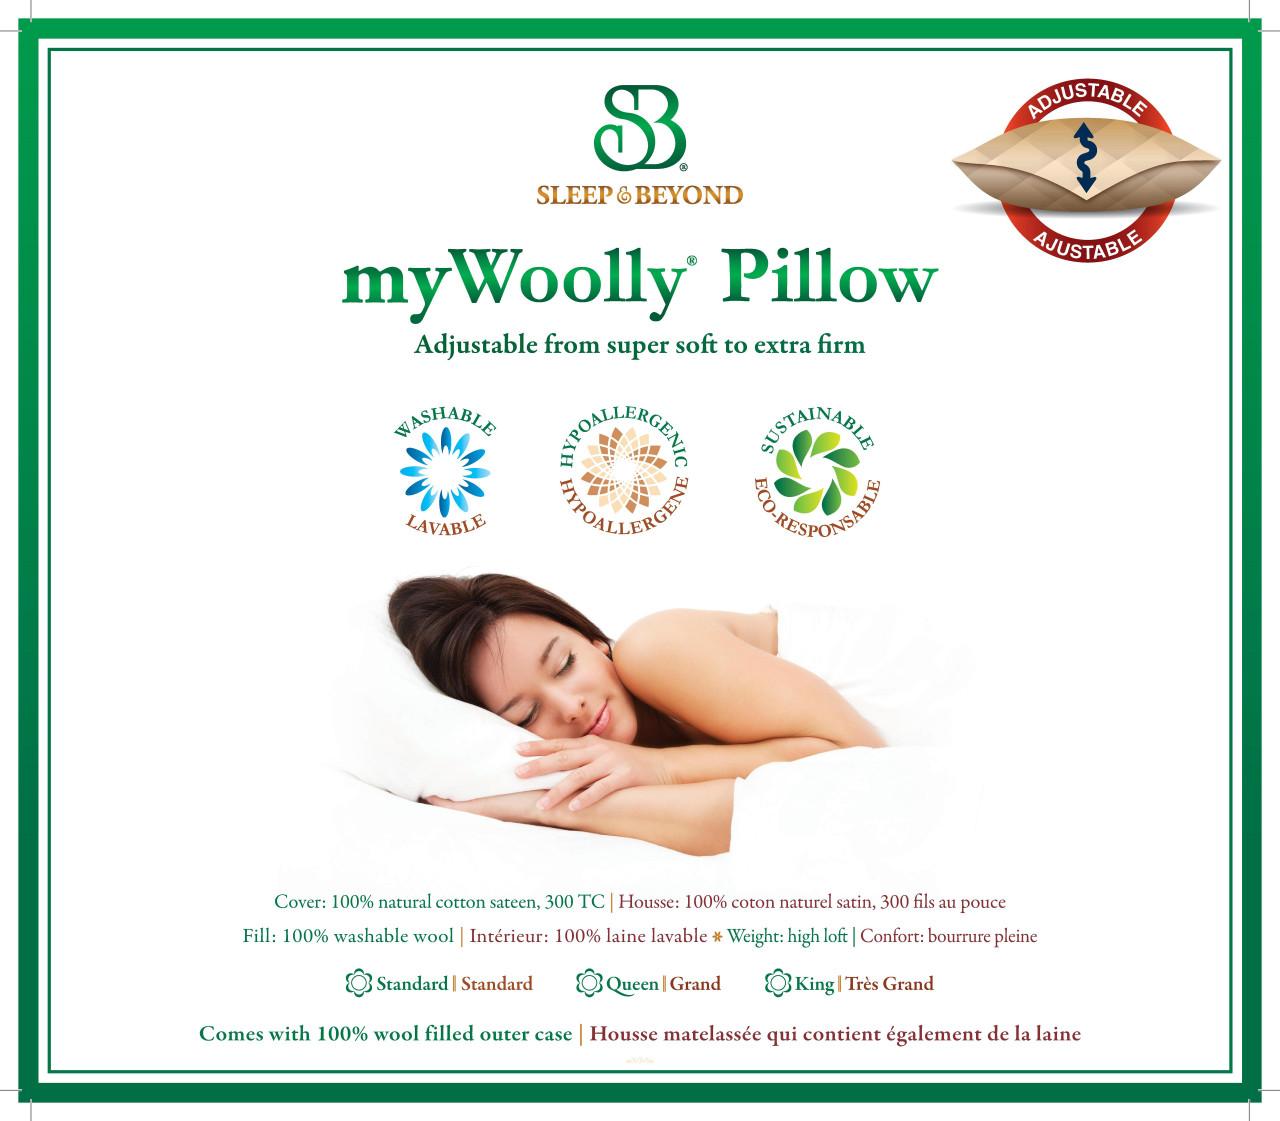 Sleep & Beyond myWoolly Pillow Back Label